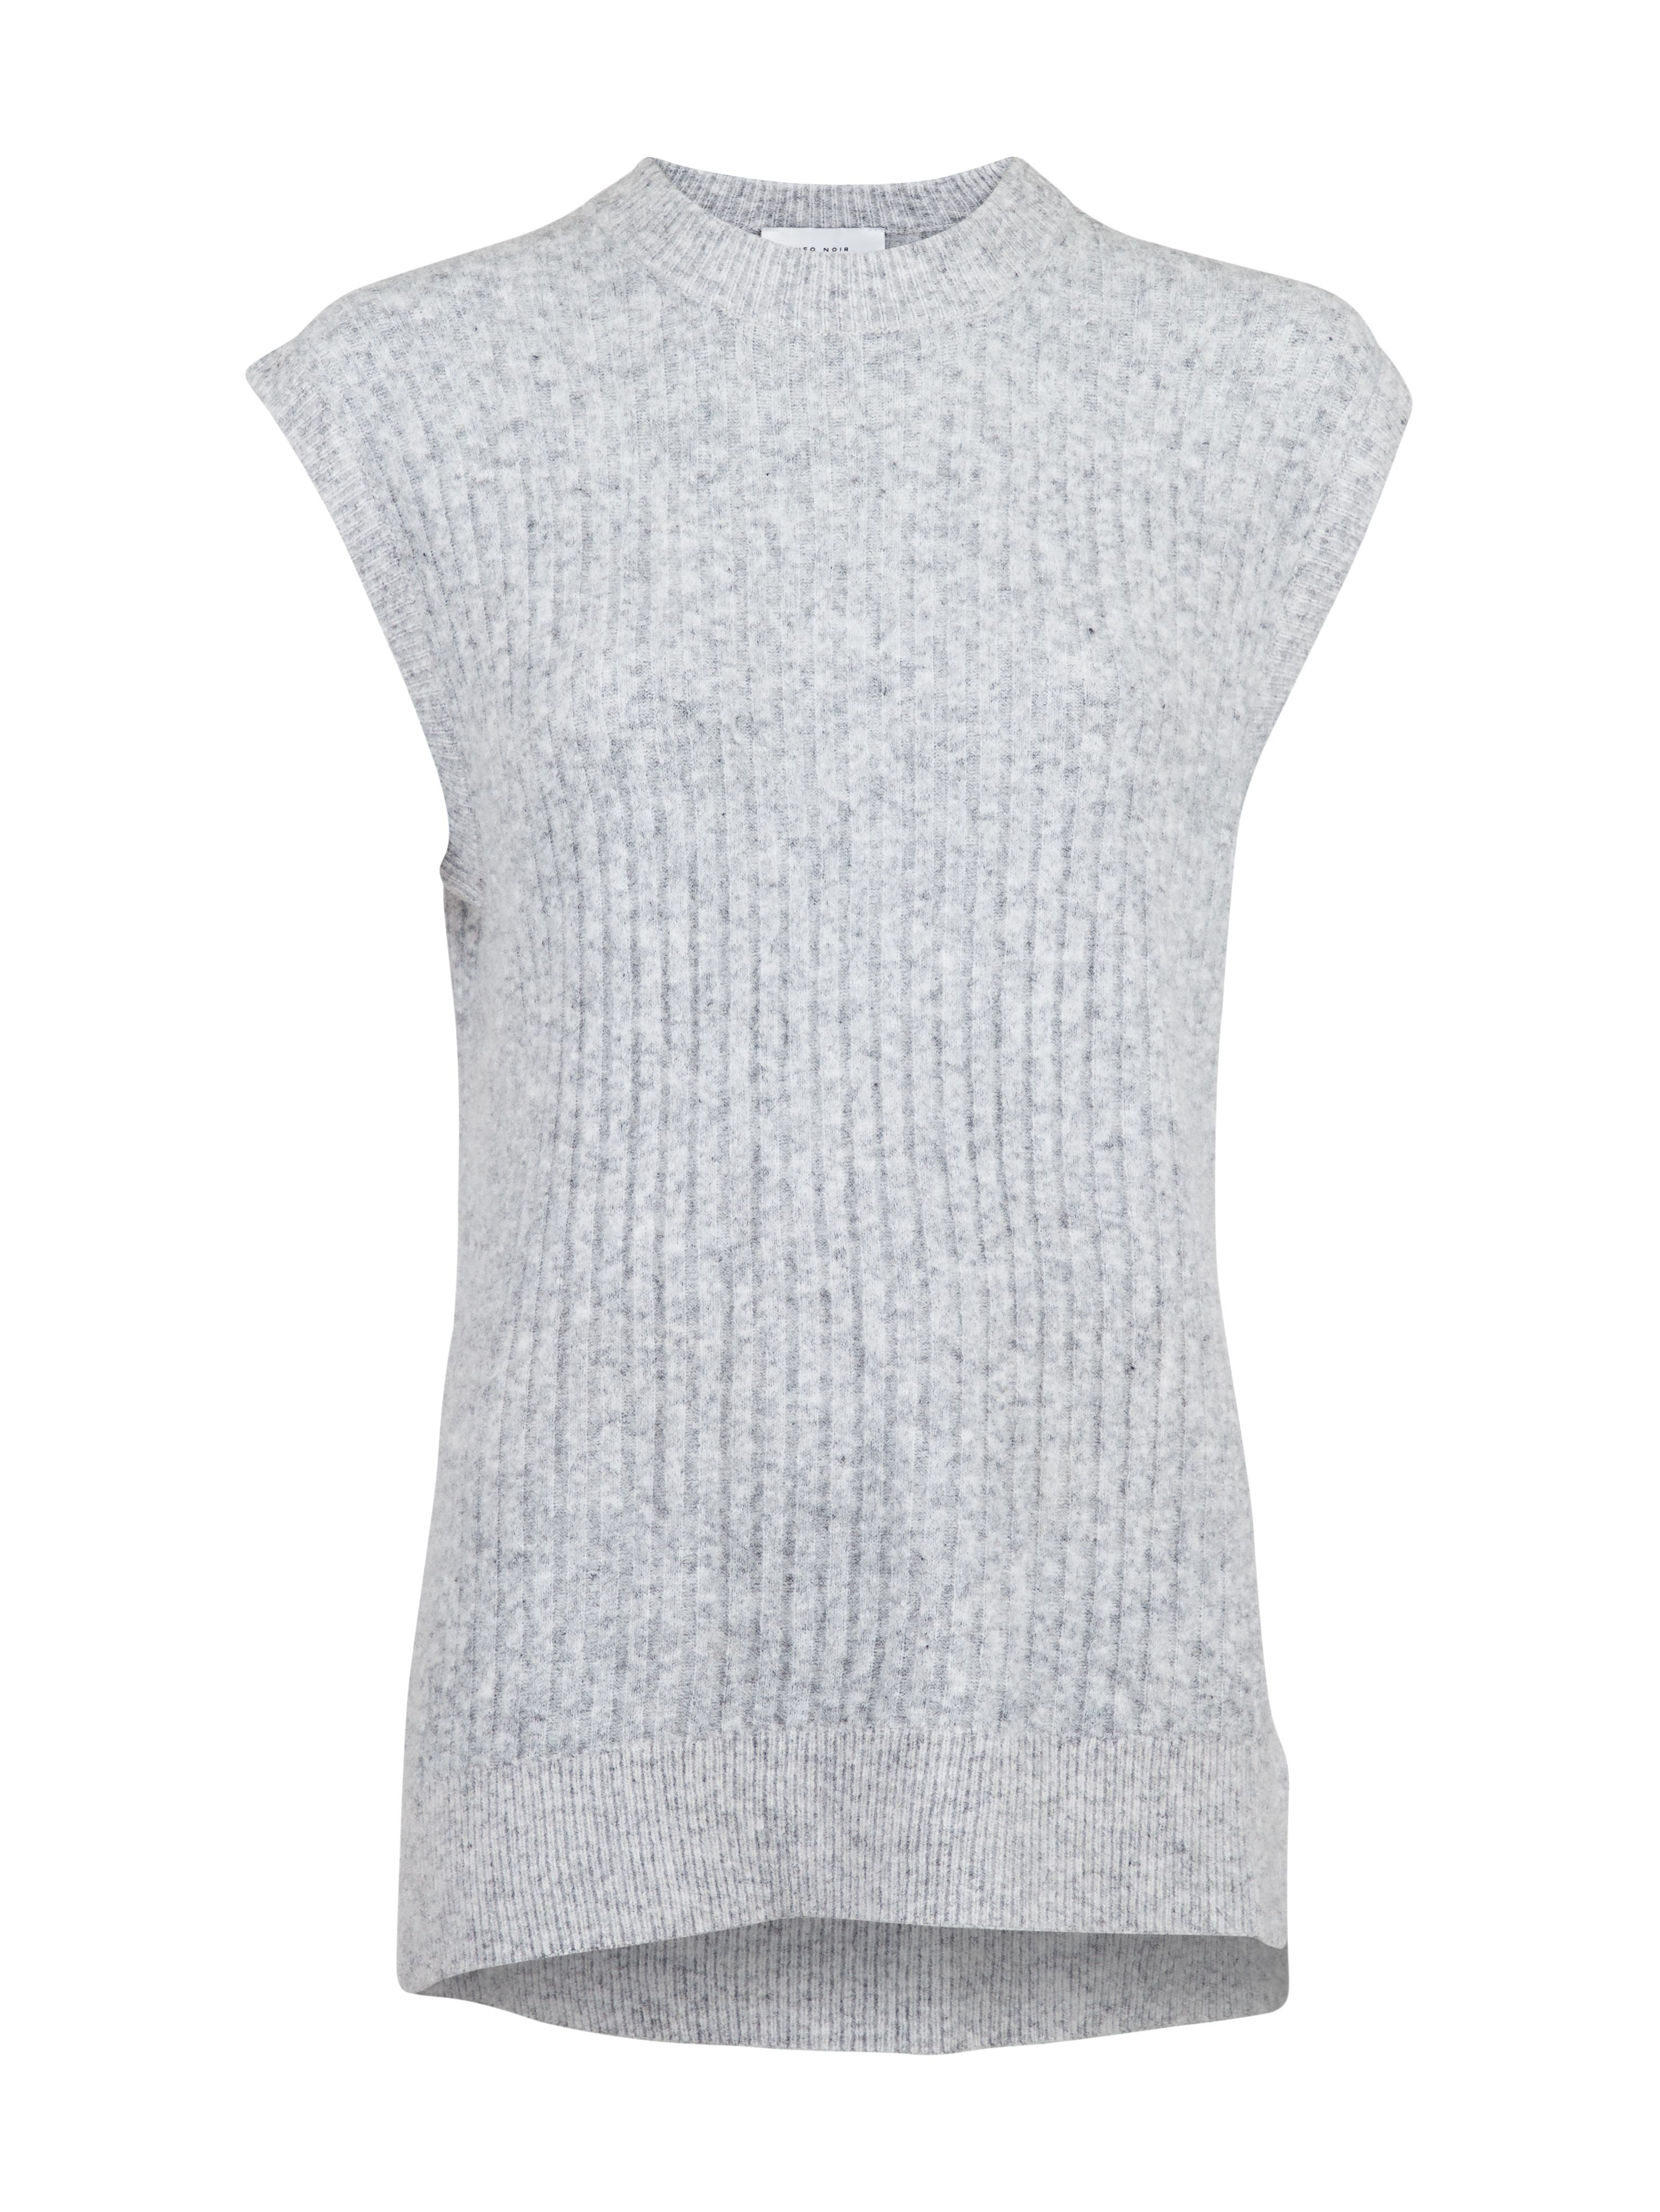 Neo Noir Natascha Knit waistcoat, light grey, large